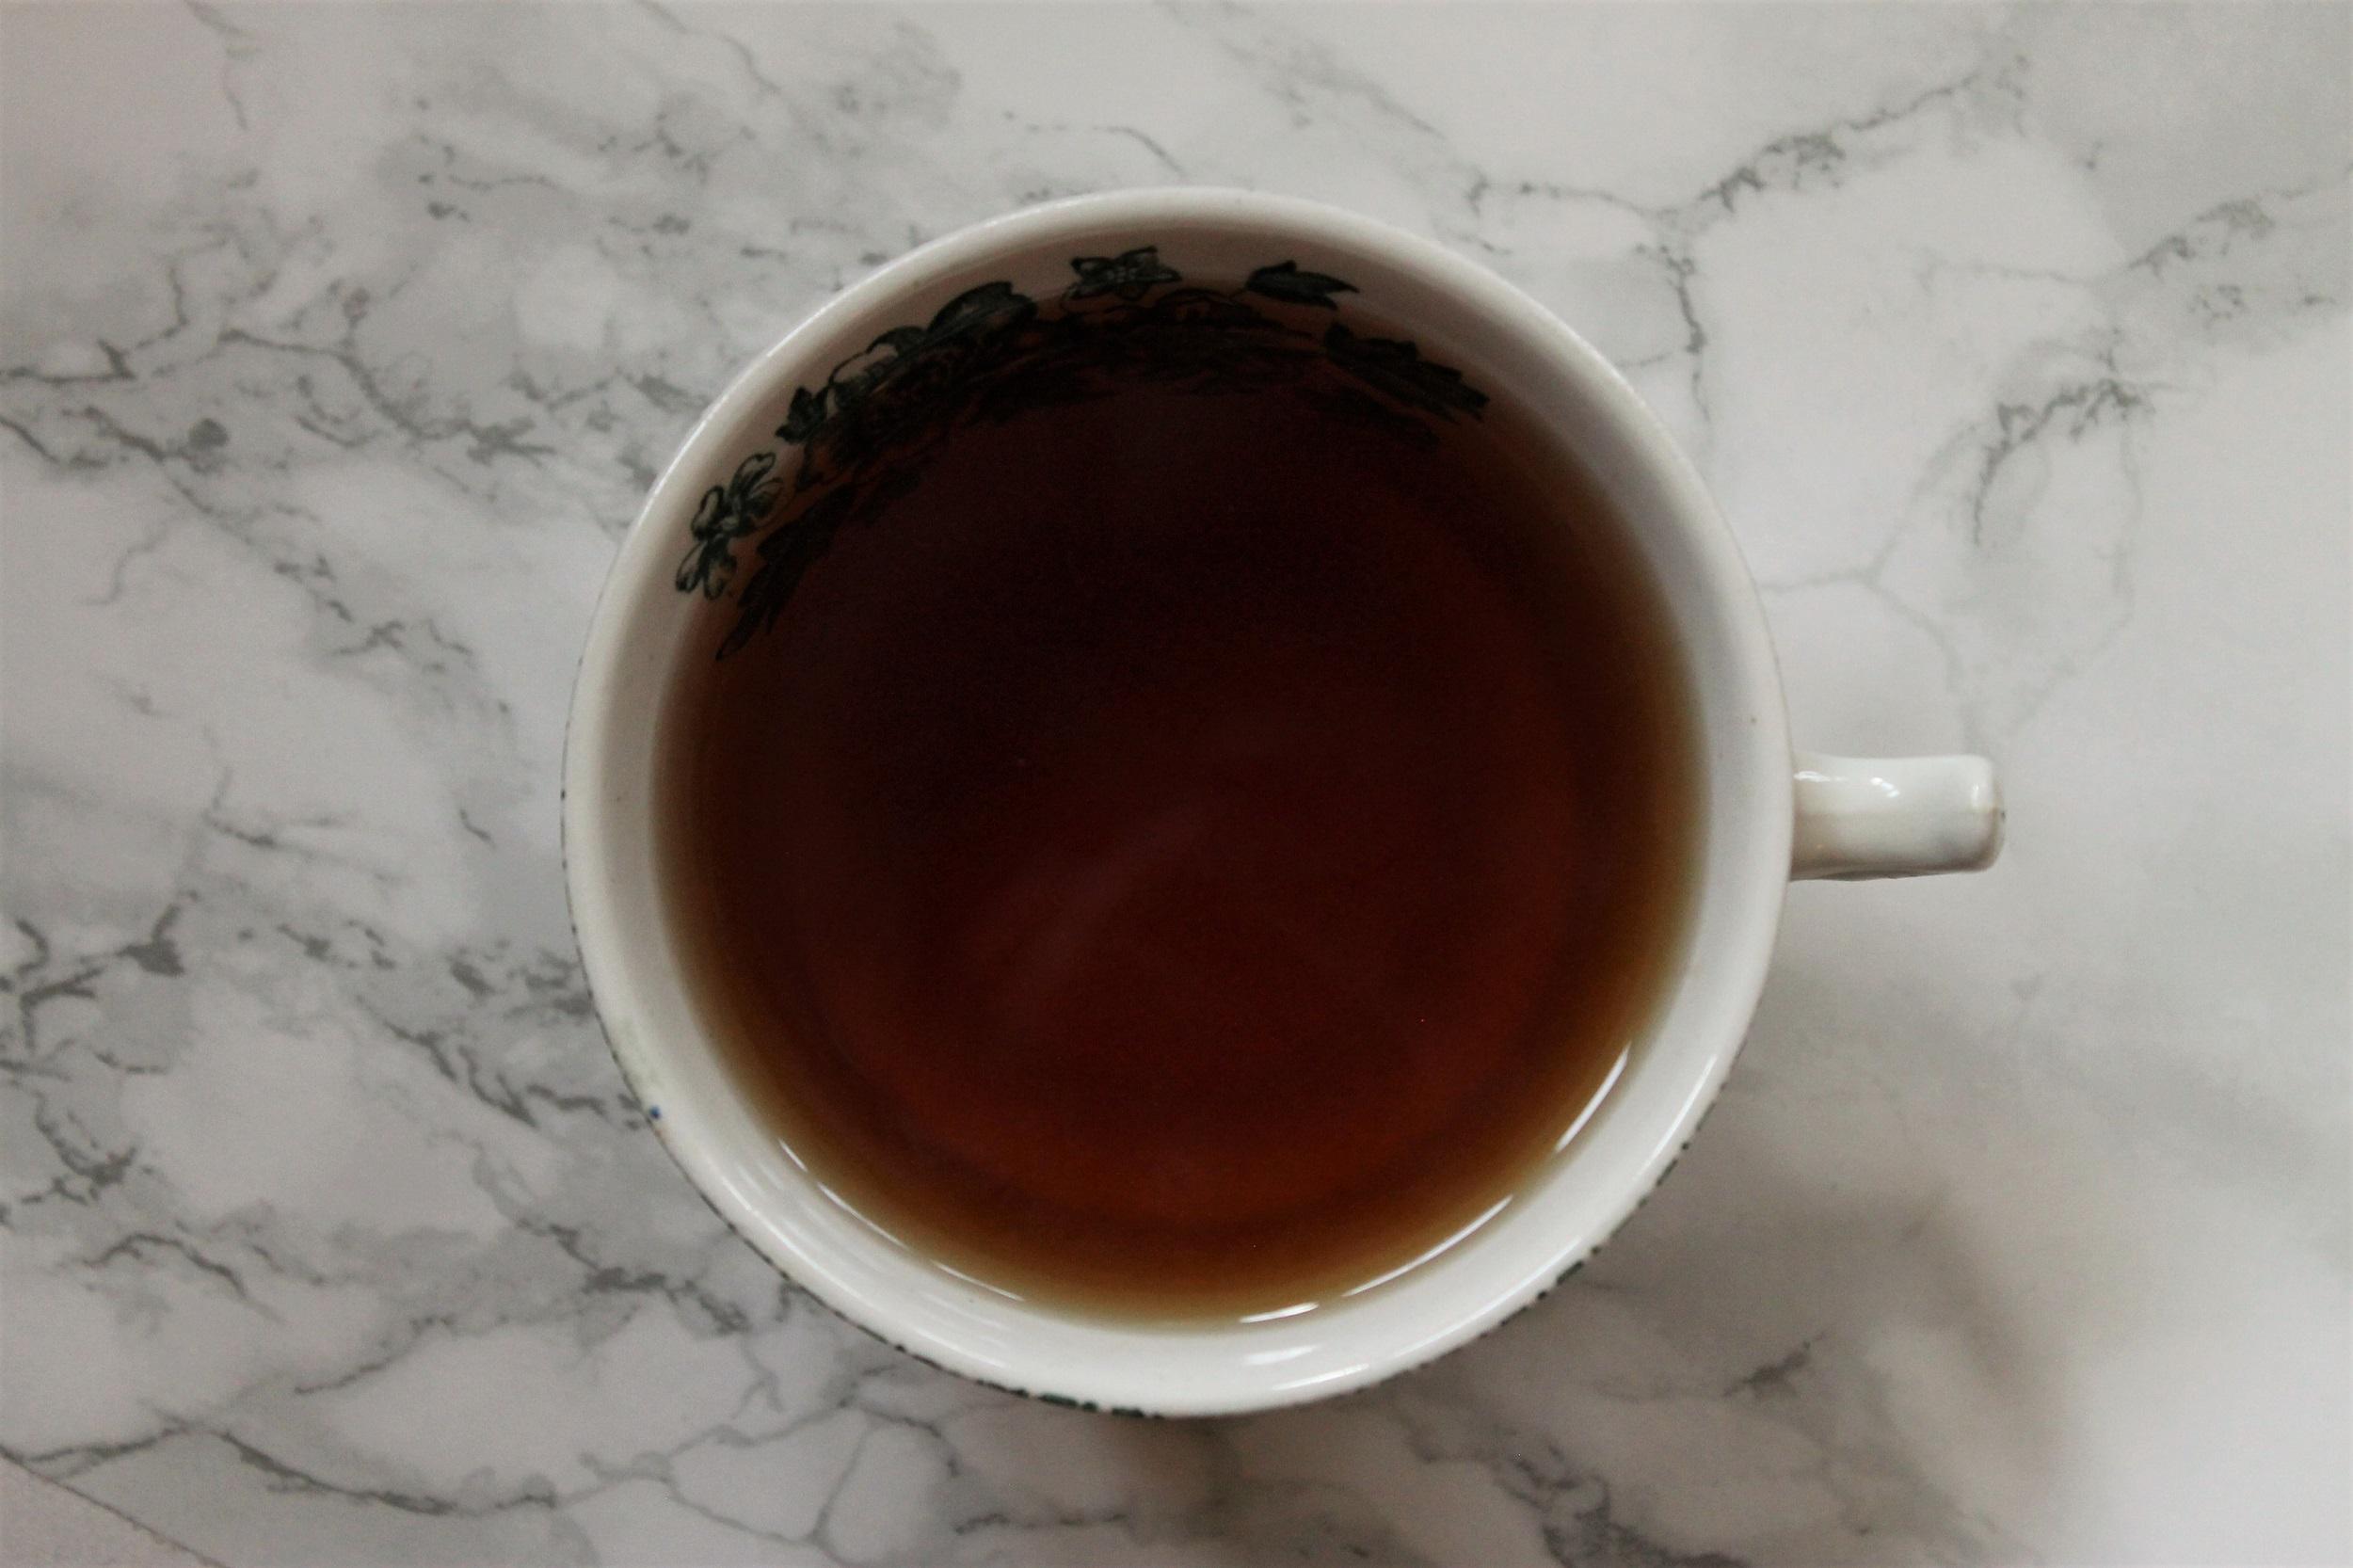 boh palas afternoon teacup